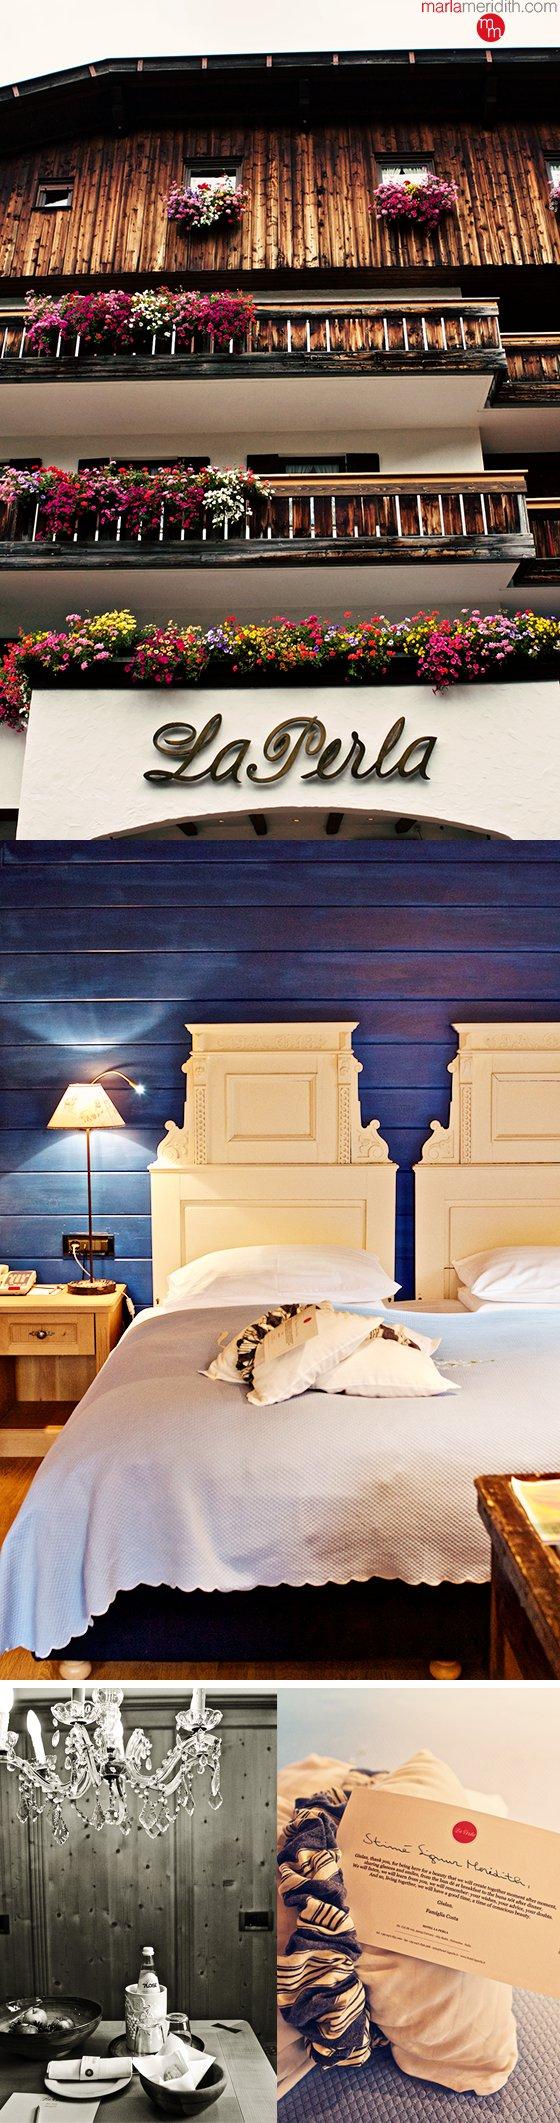 My favorite village in the #Dolomites Corvara! Hotel La Perla is wonderful! MarlaMeridith.com ( @marlameridith ) #italy #travel